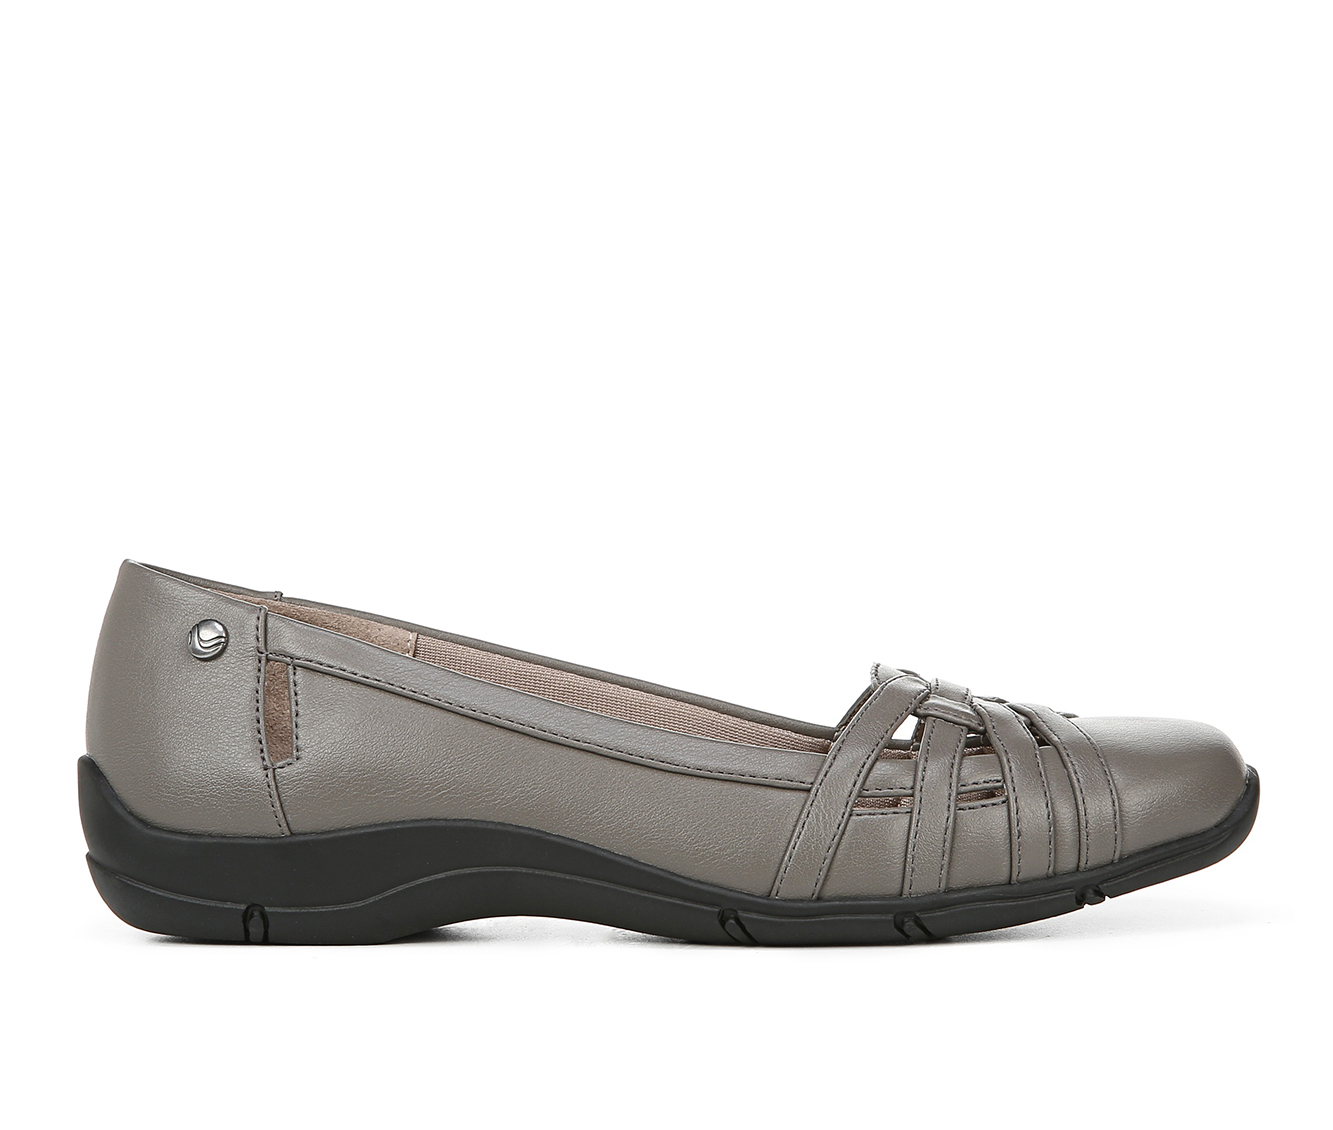 LifeStride Diverse Women's Shoe (Gray Faux Leather)